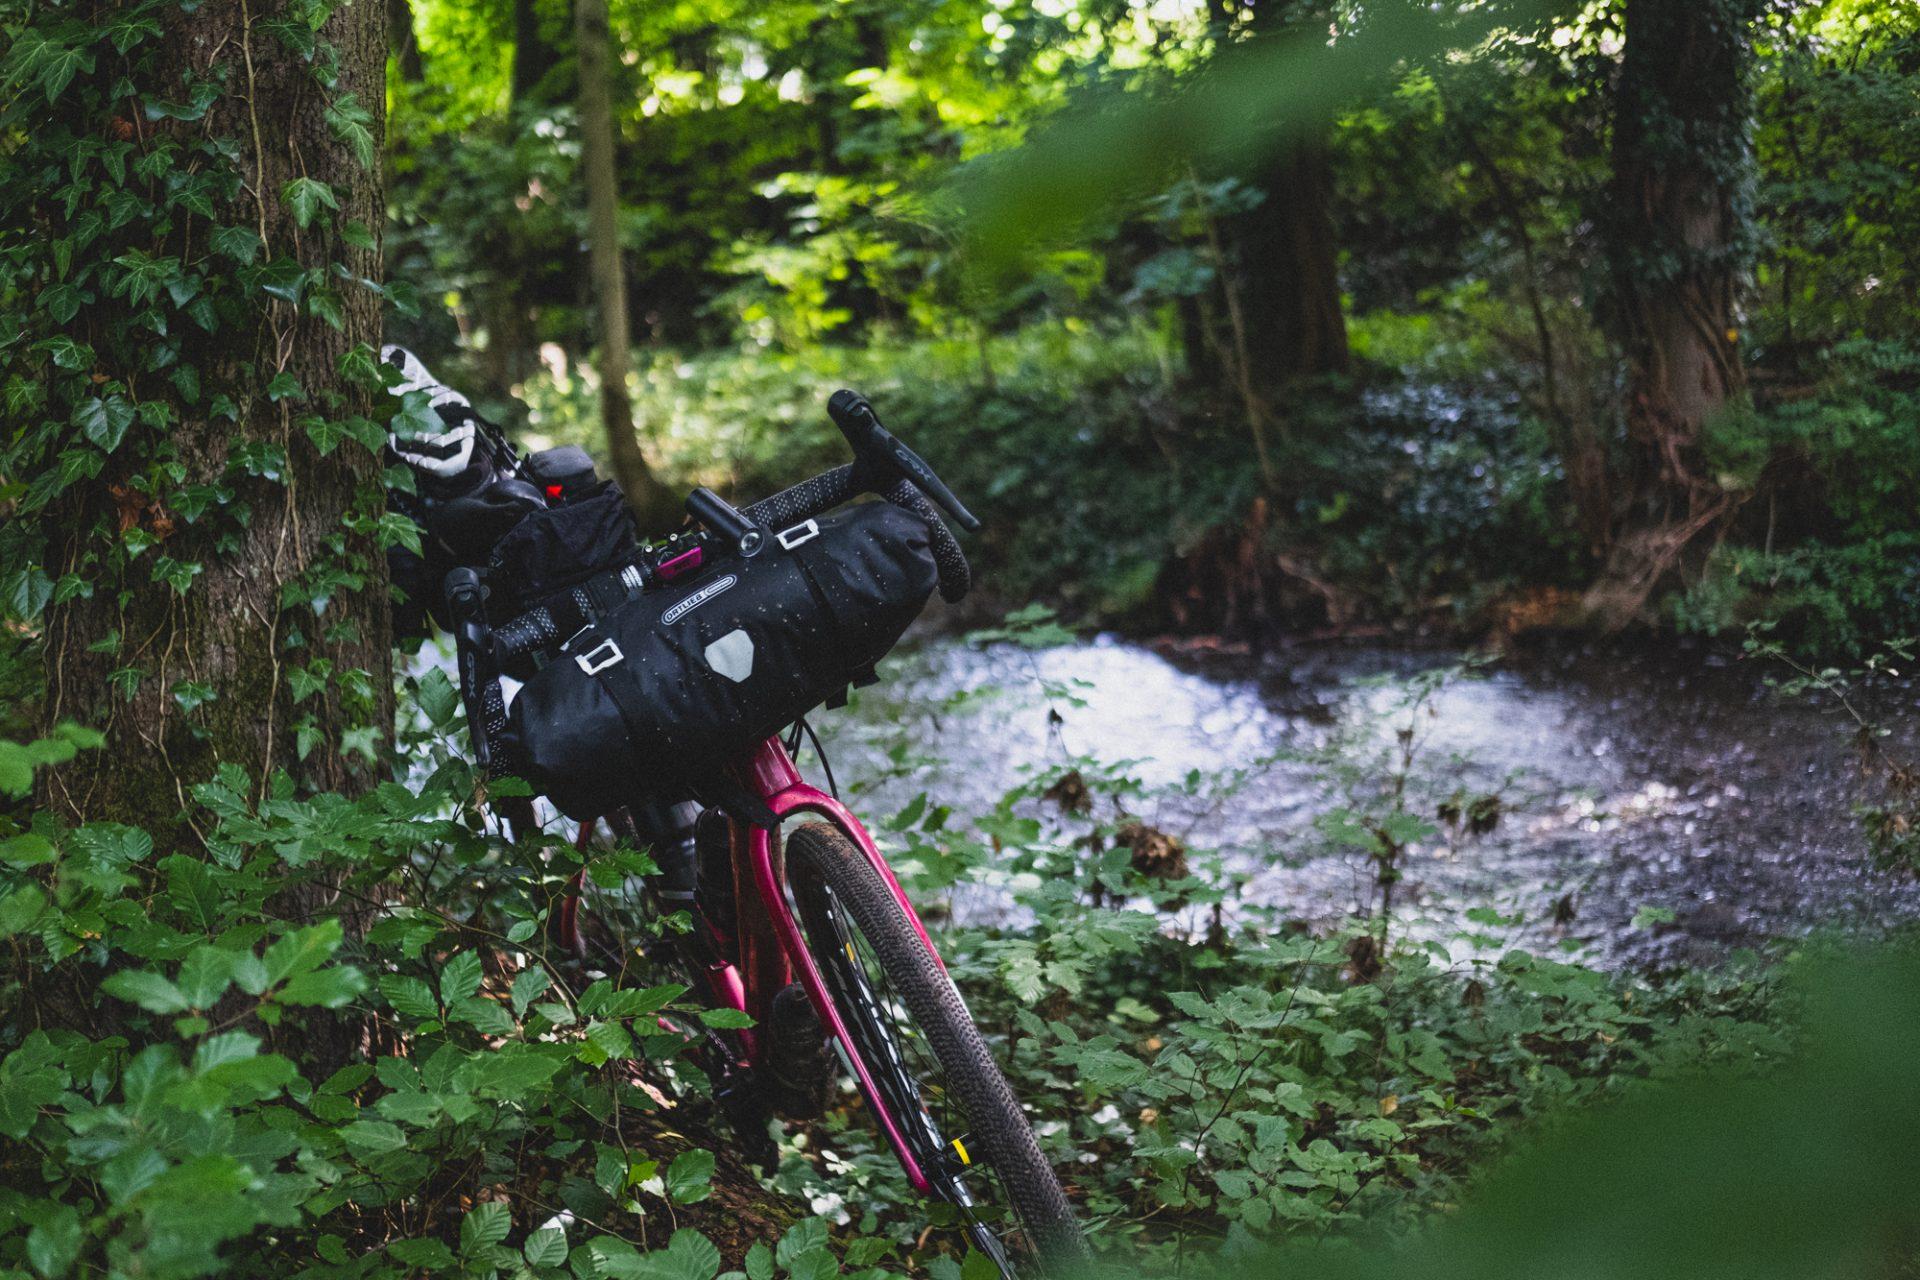 Les-Rookies-cinq-spots-amsterdam-berlin-bikepacking-0222